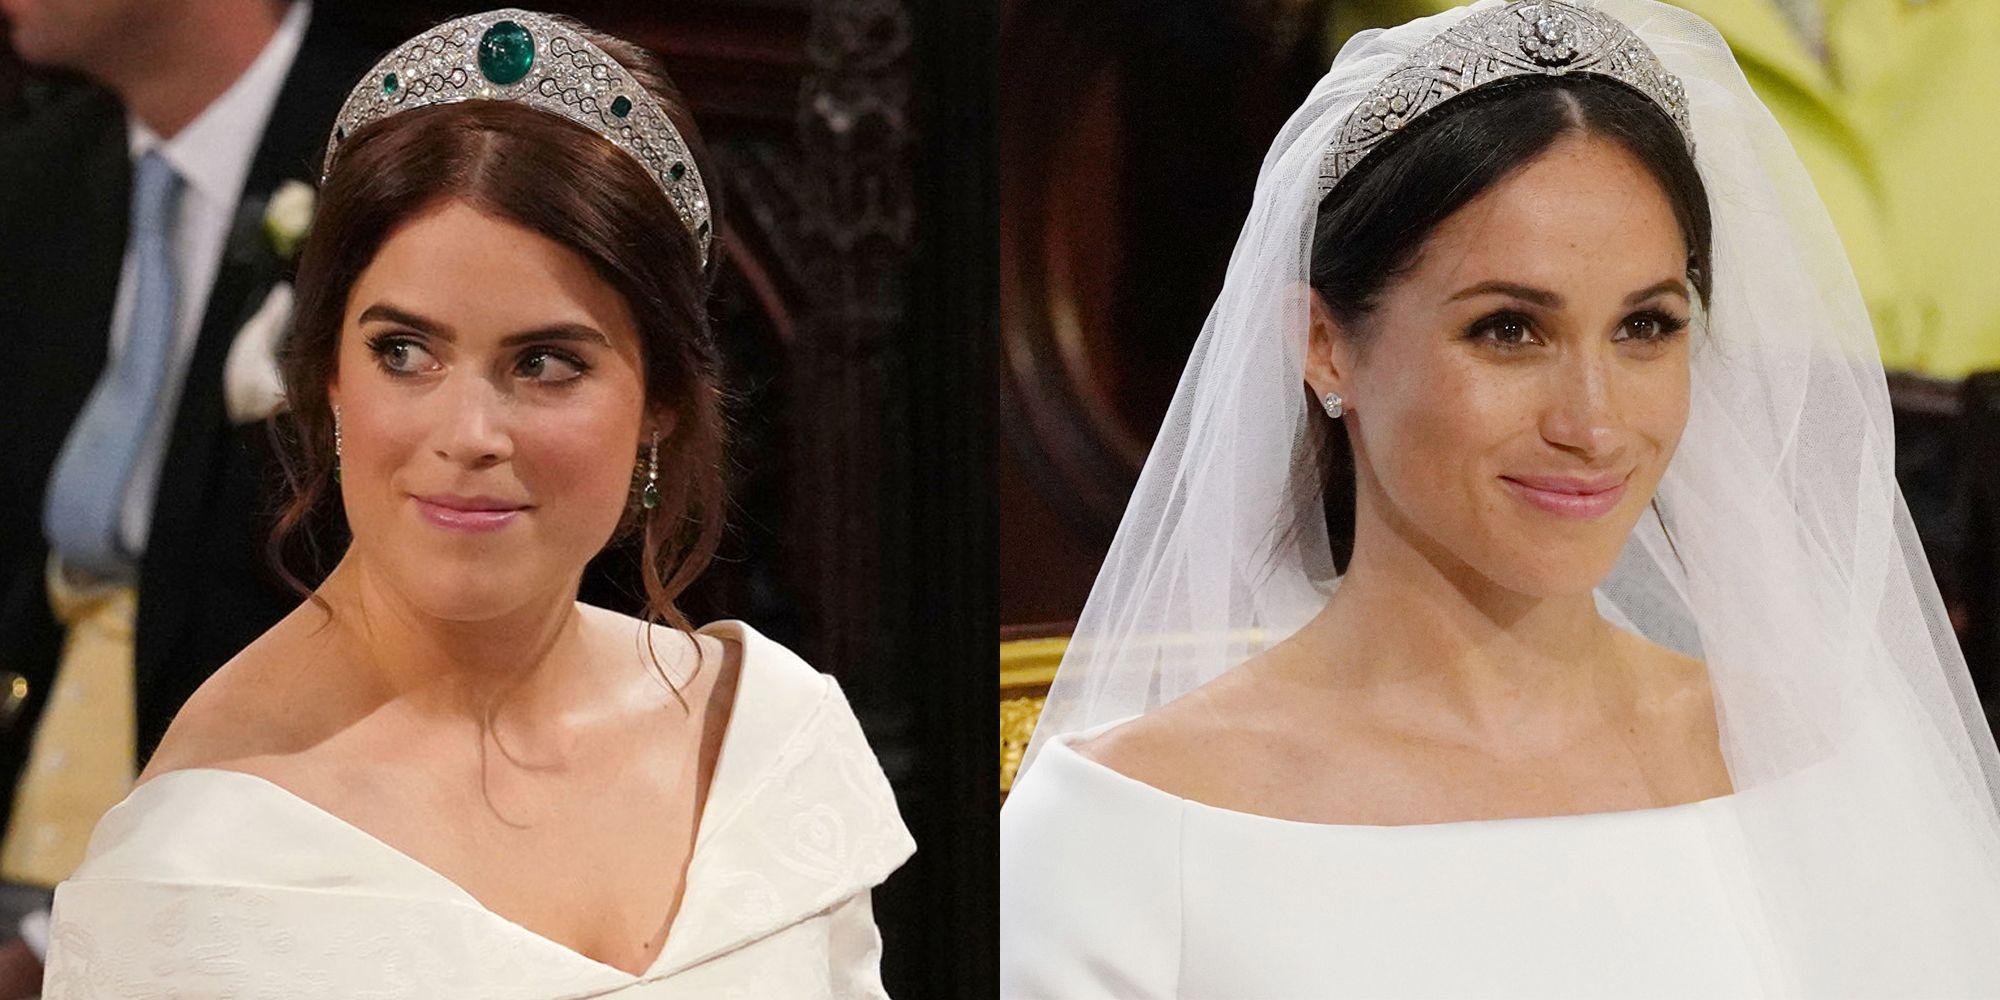 how princess eugenie s royal wedding tiara compared to meghan markle s royal wedding tiara compared to meghan